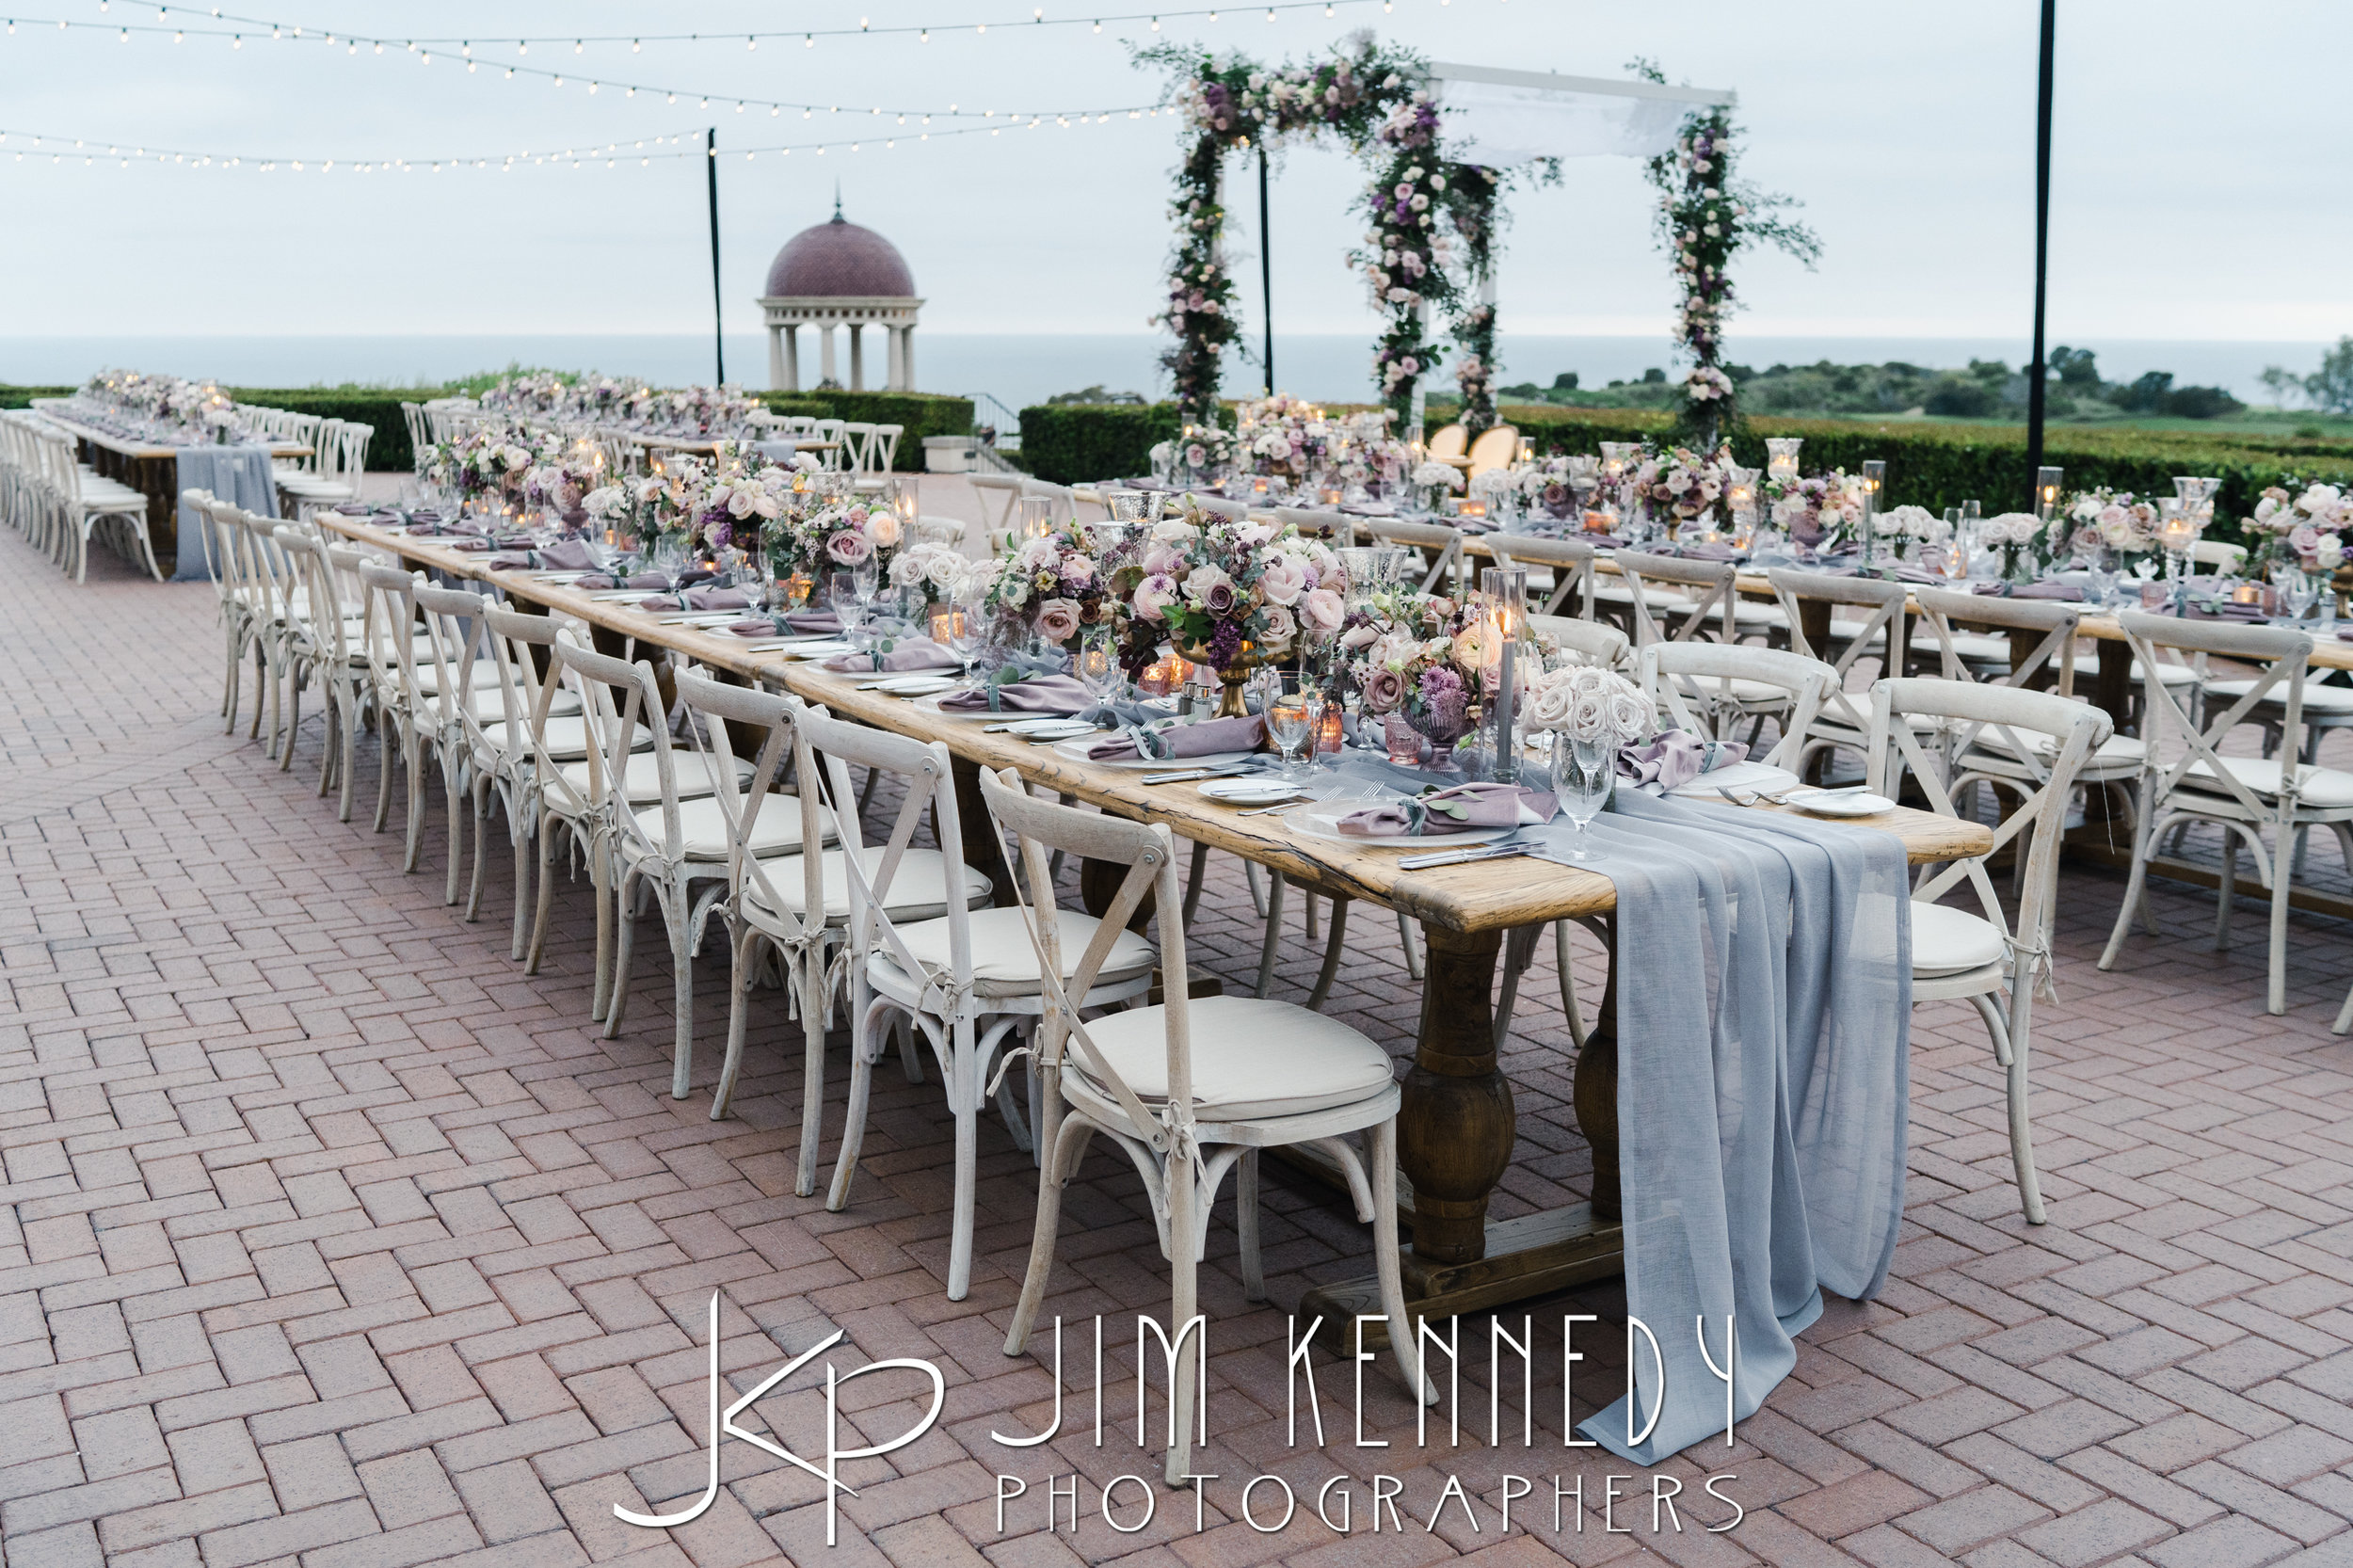 pelican-hill-wedding-jim-kenedy-photographers_0203.JPG